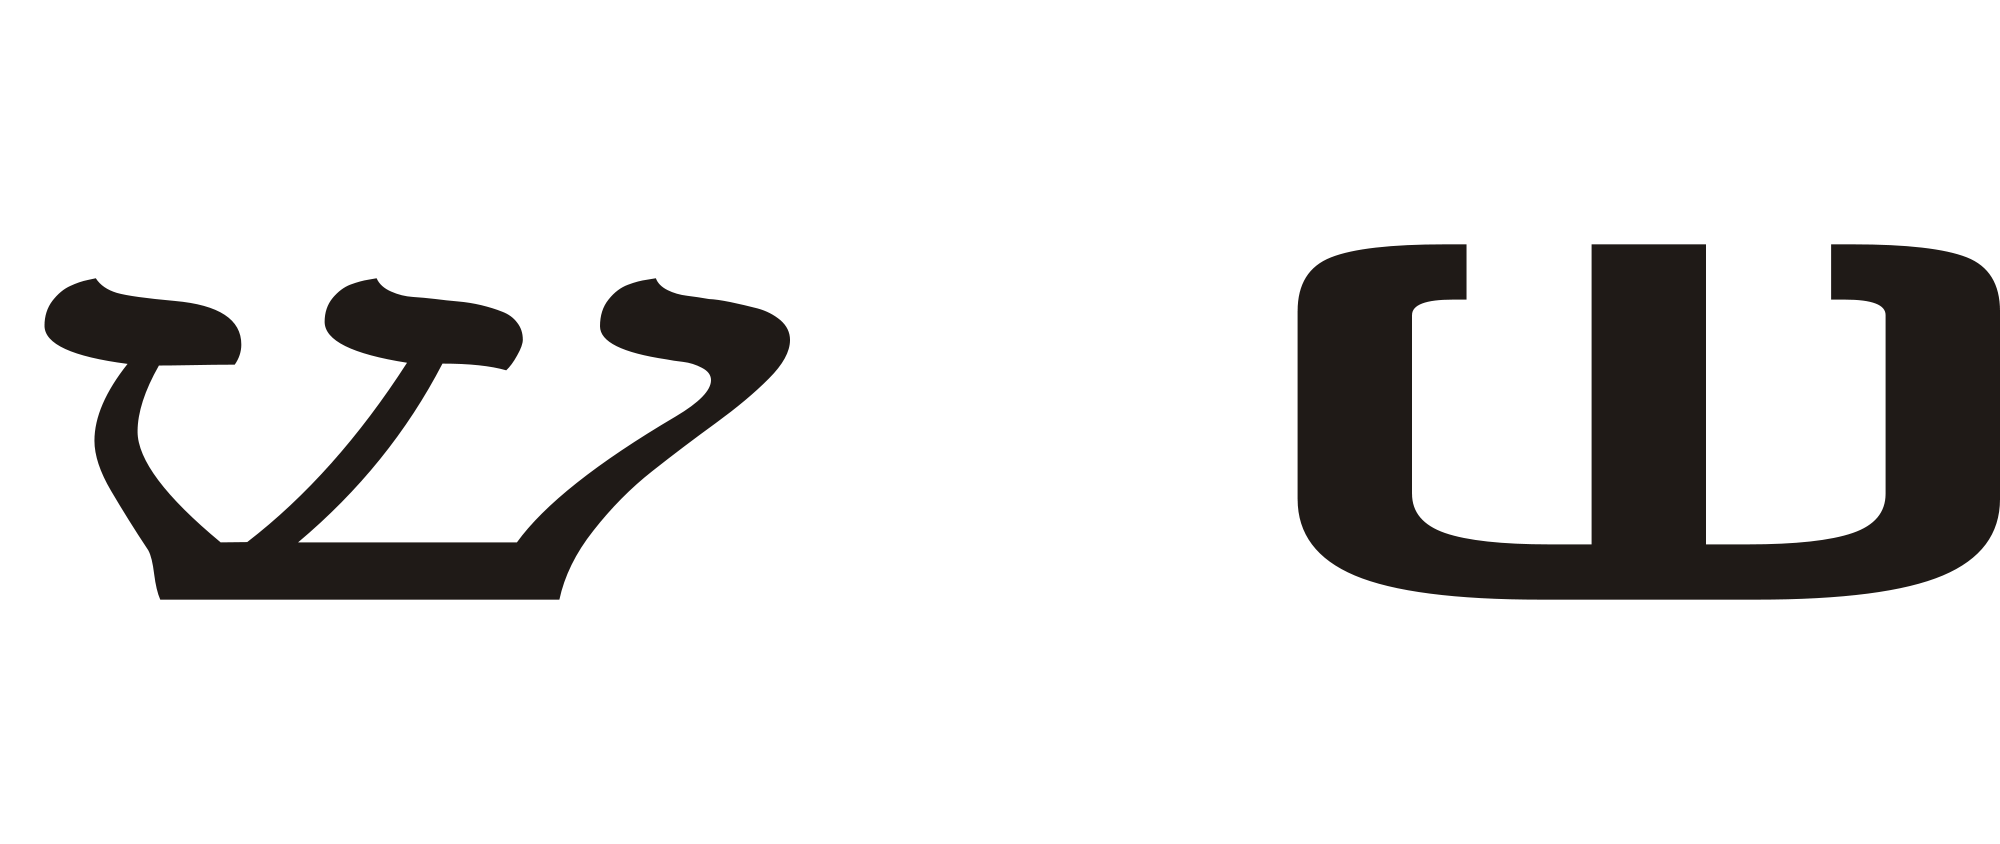 Dreidel clipart svg. File hebrew letter shin